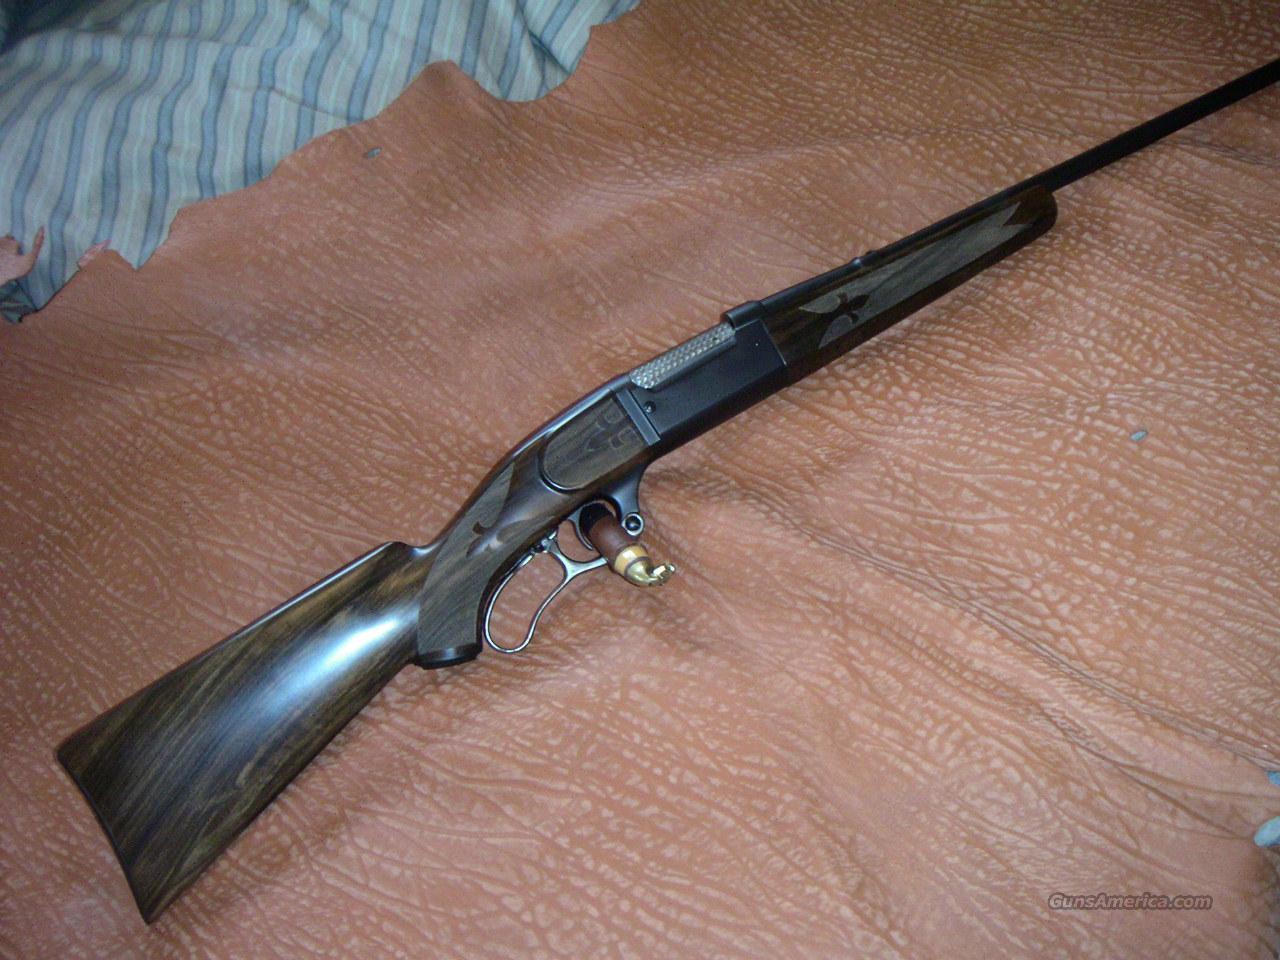 Custom Savage 99F, 308 Rifle for sale